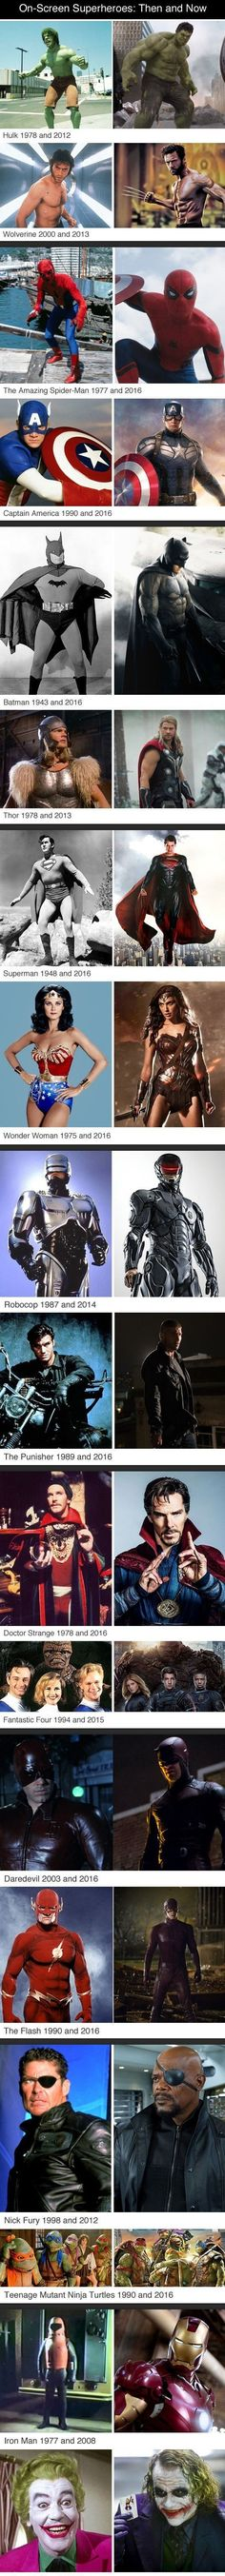 Ben Afflack was a terrible Batman. Great Bruce Wayne though. Christian Bale, alllll the way